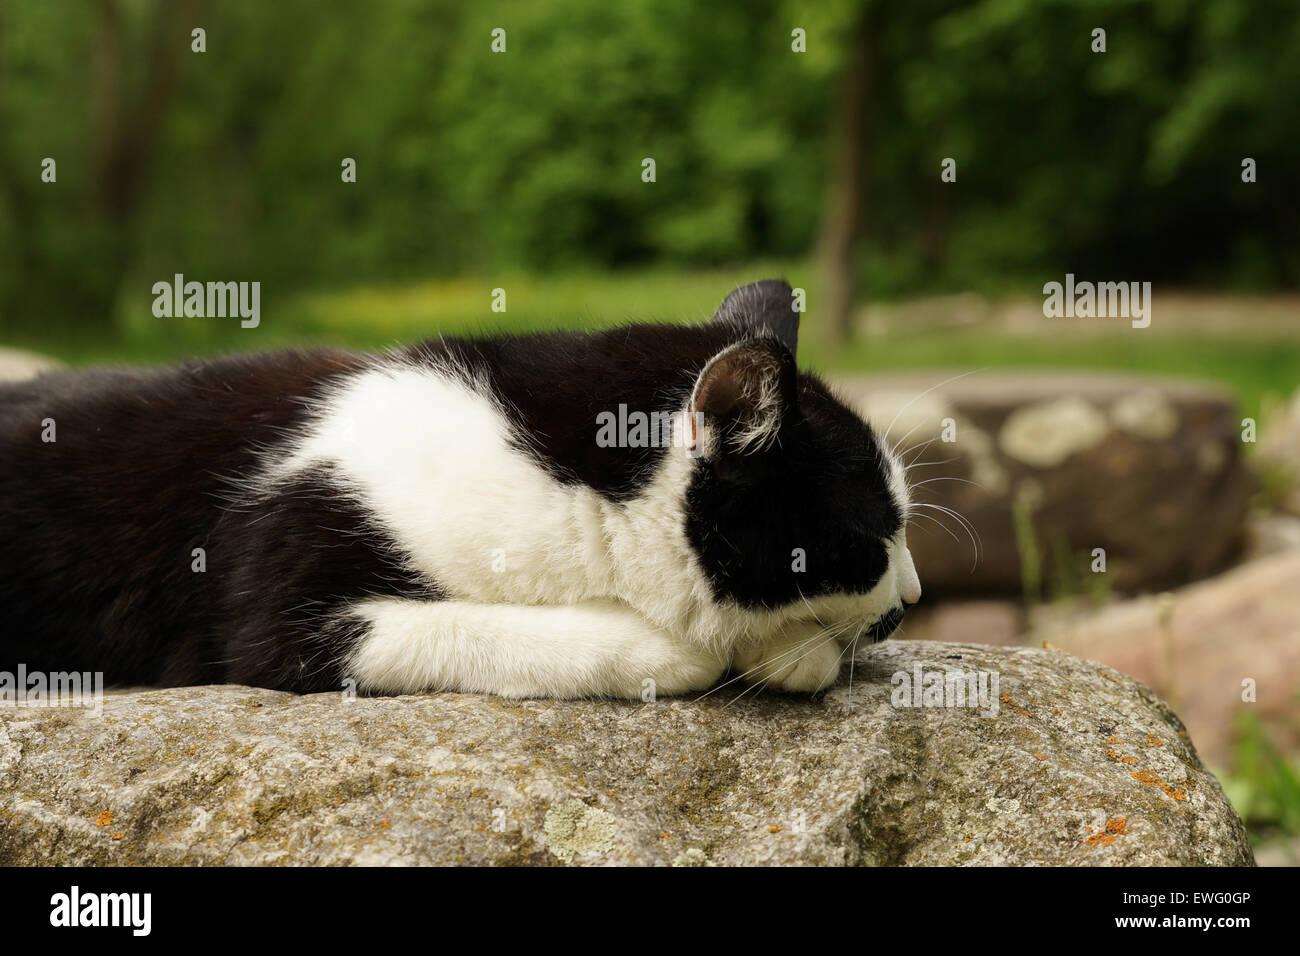 Cat sleeping on a rock - Stock Image